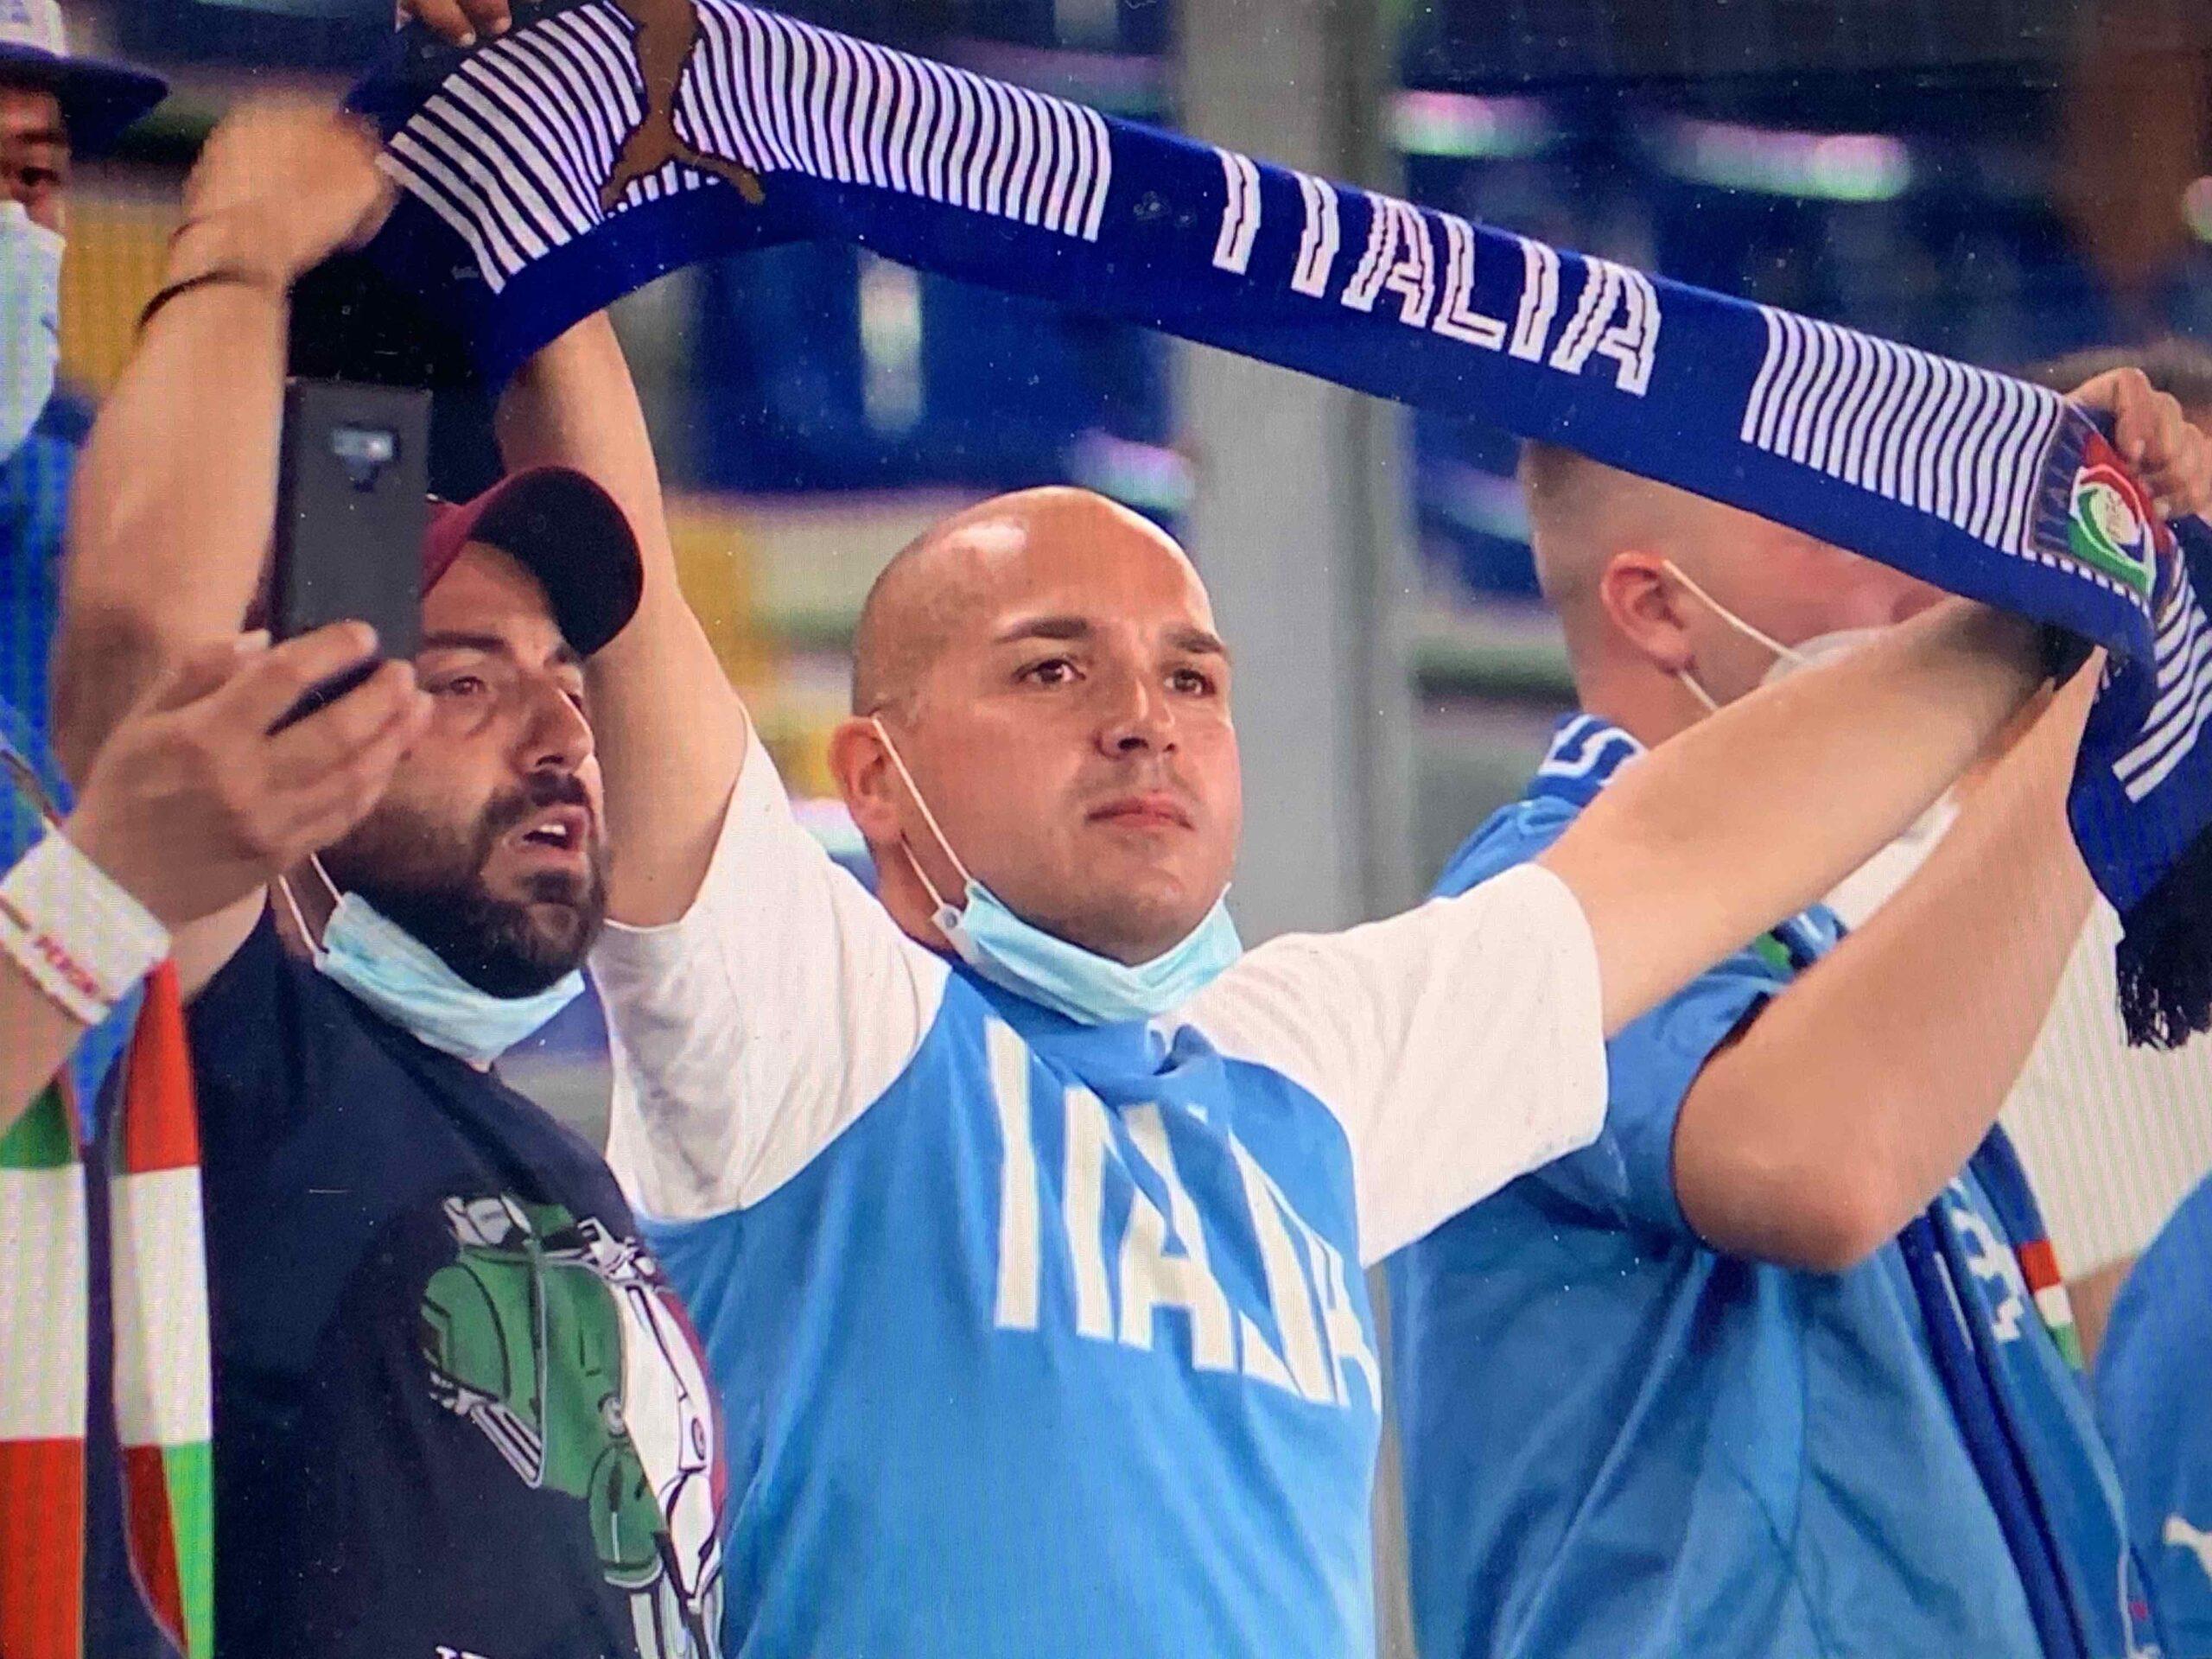 voetbaltermen Italiaans